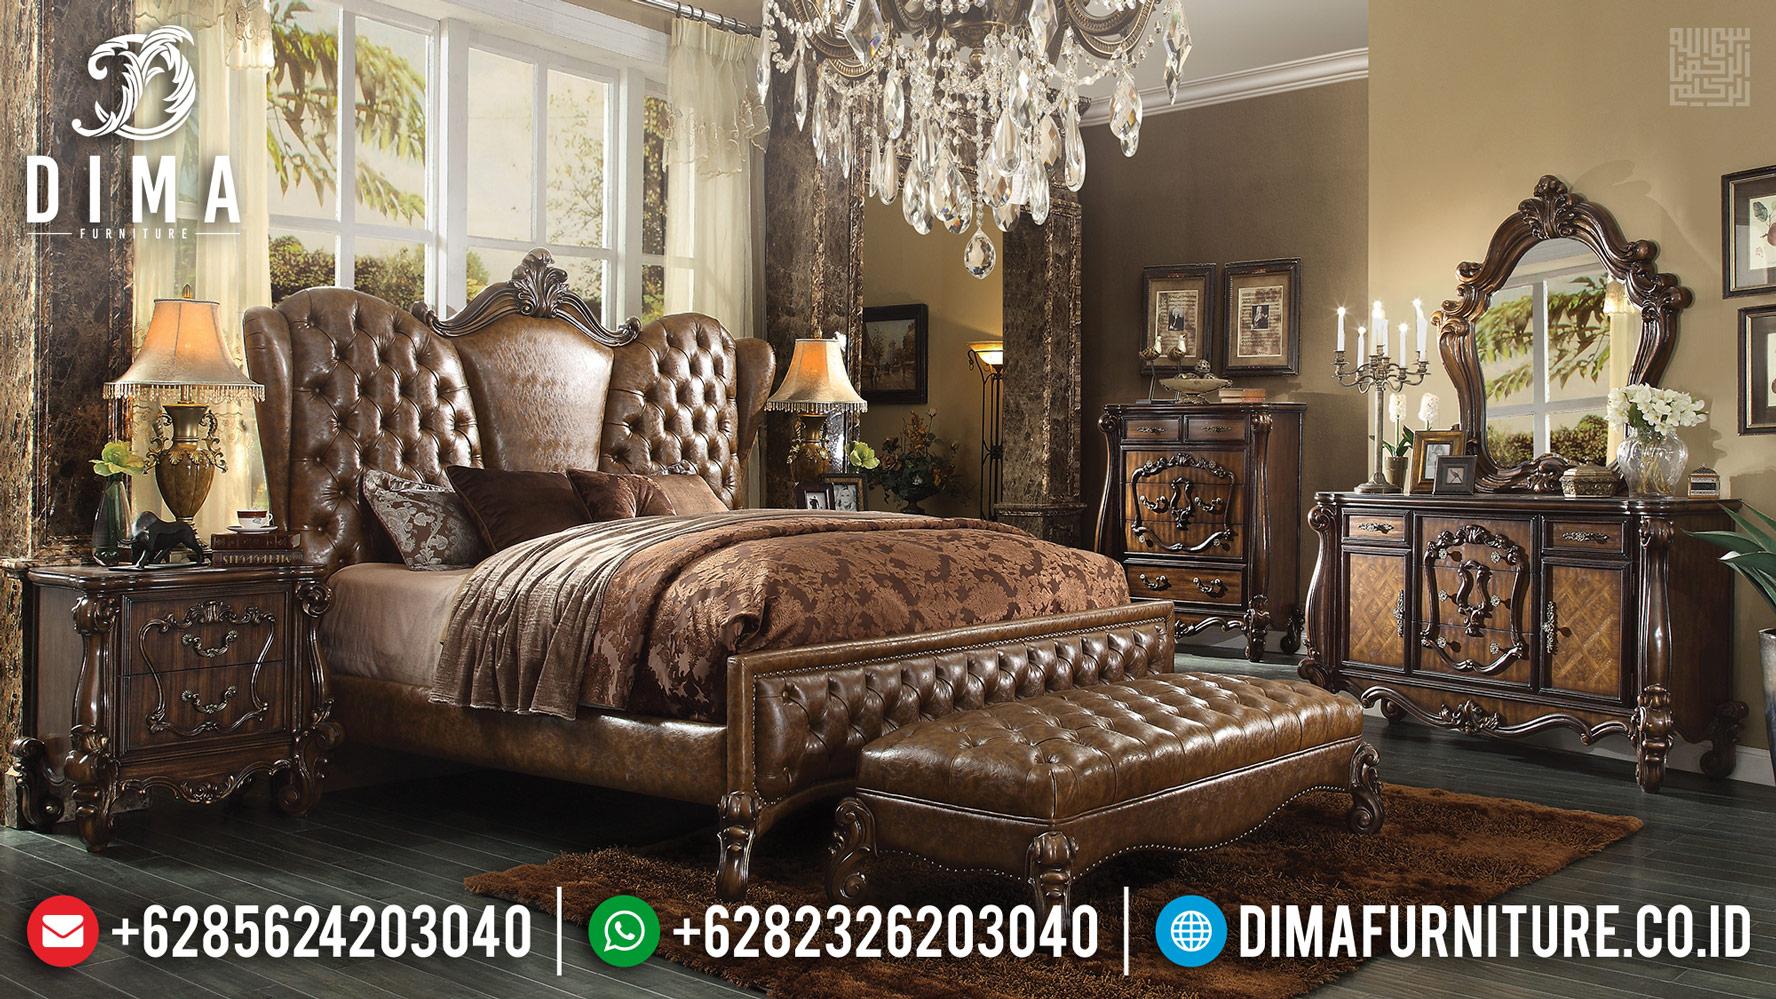 Jual Tempat Tidur Mewah Valencia Ukiran Classic Furniture Jepara TTJ-0429